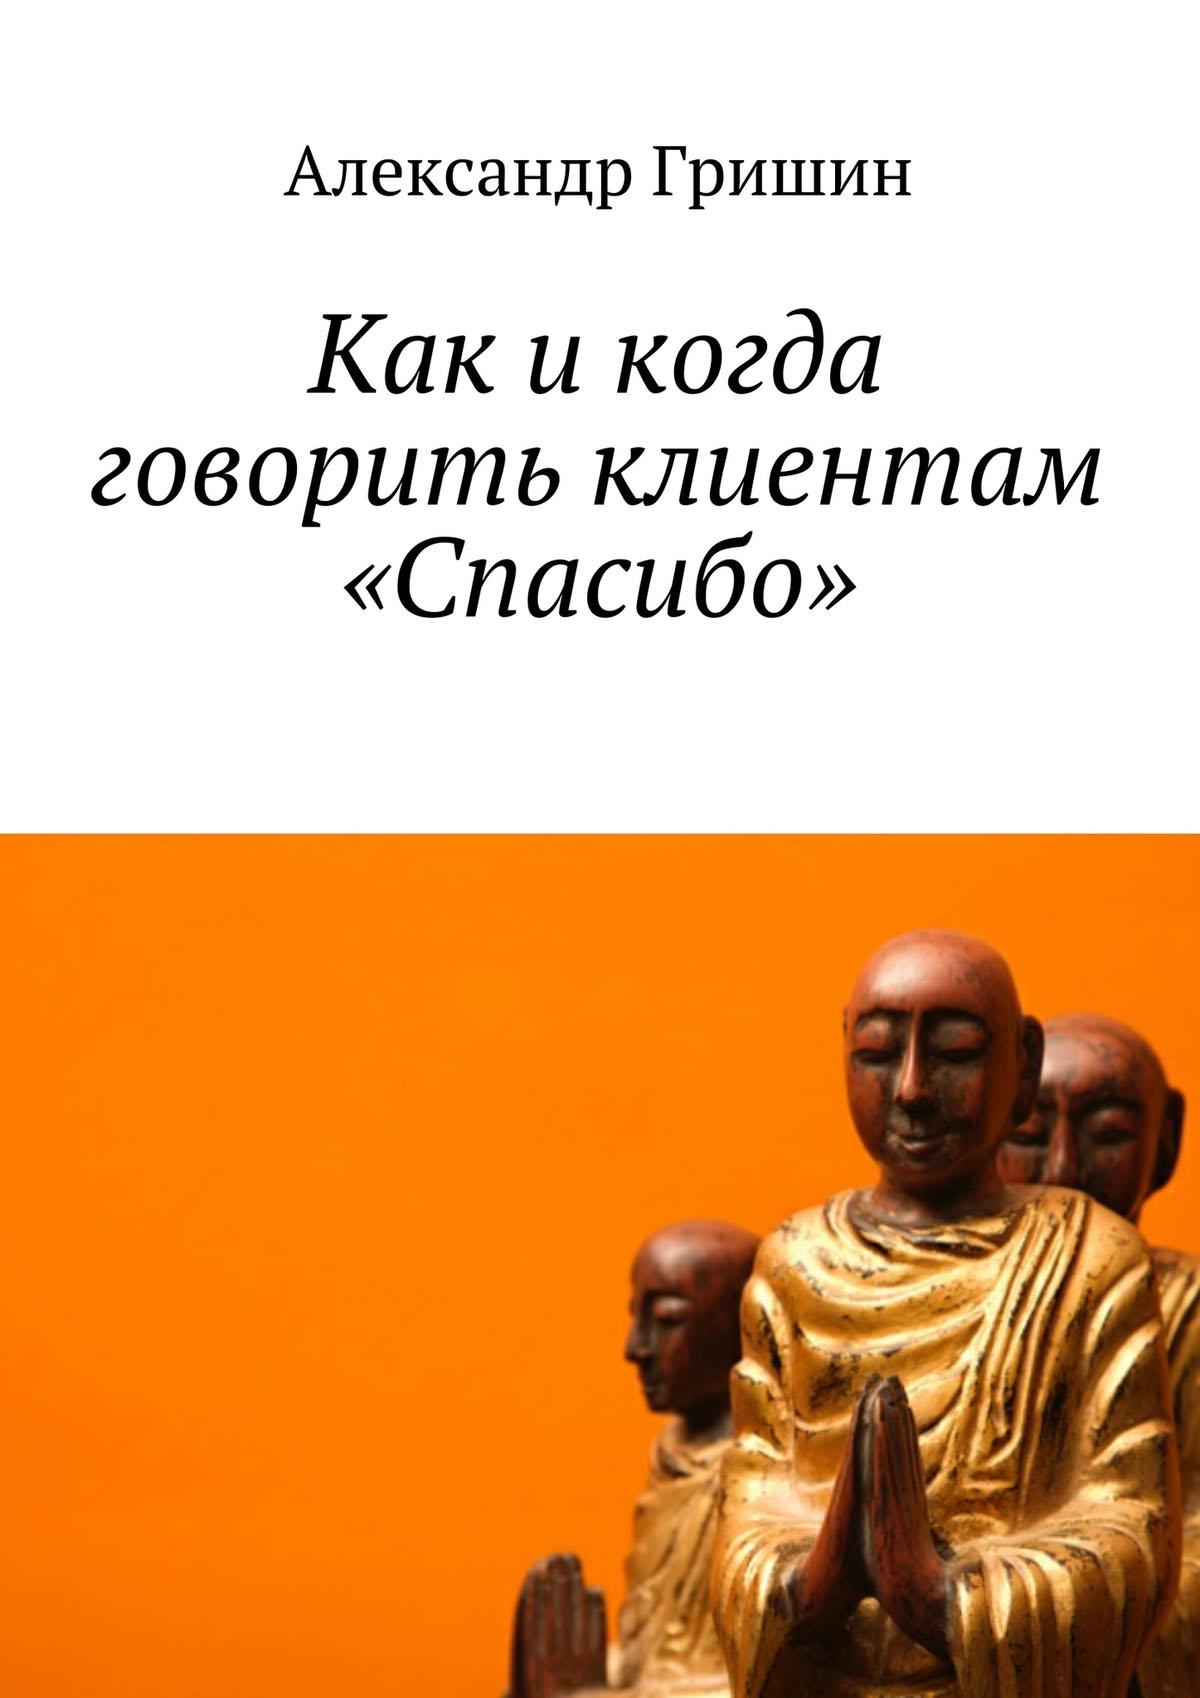 Александр Гришин Как икогда говорить клиентам «Спасибо»